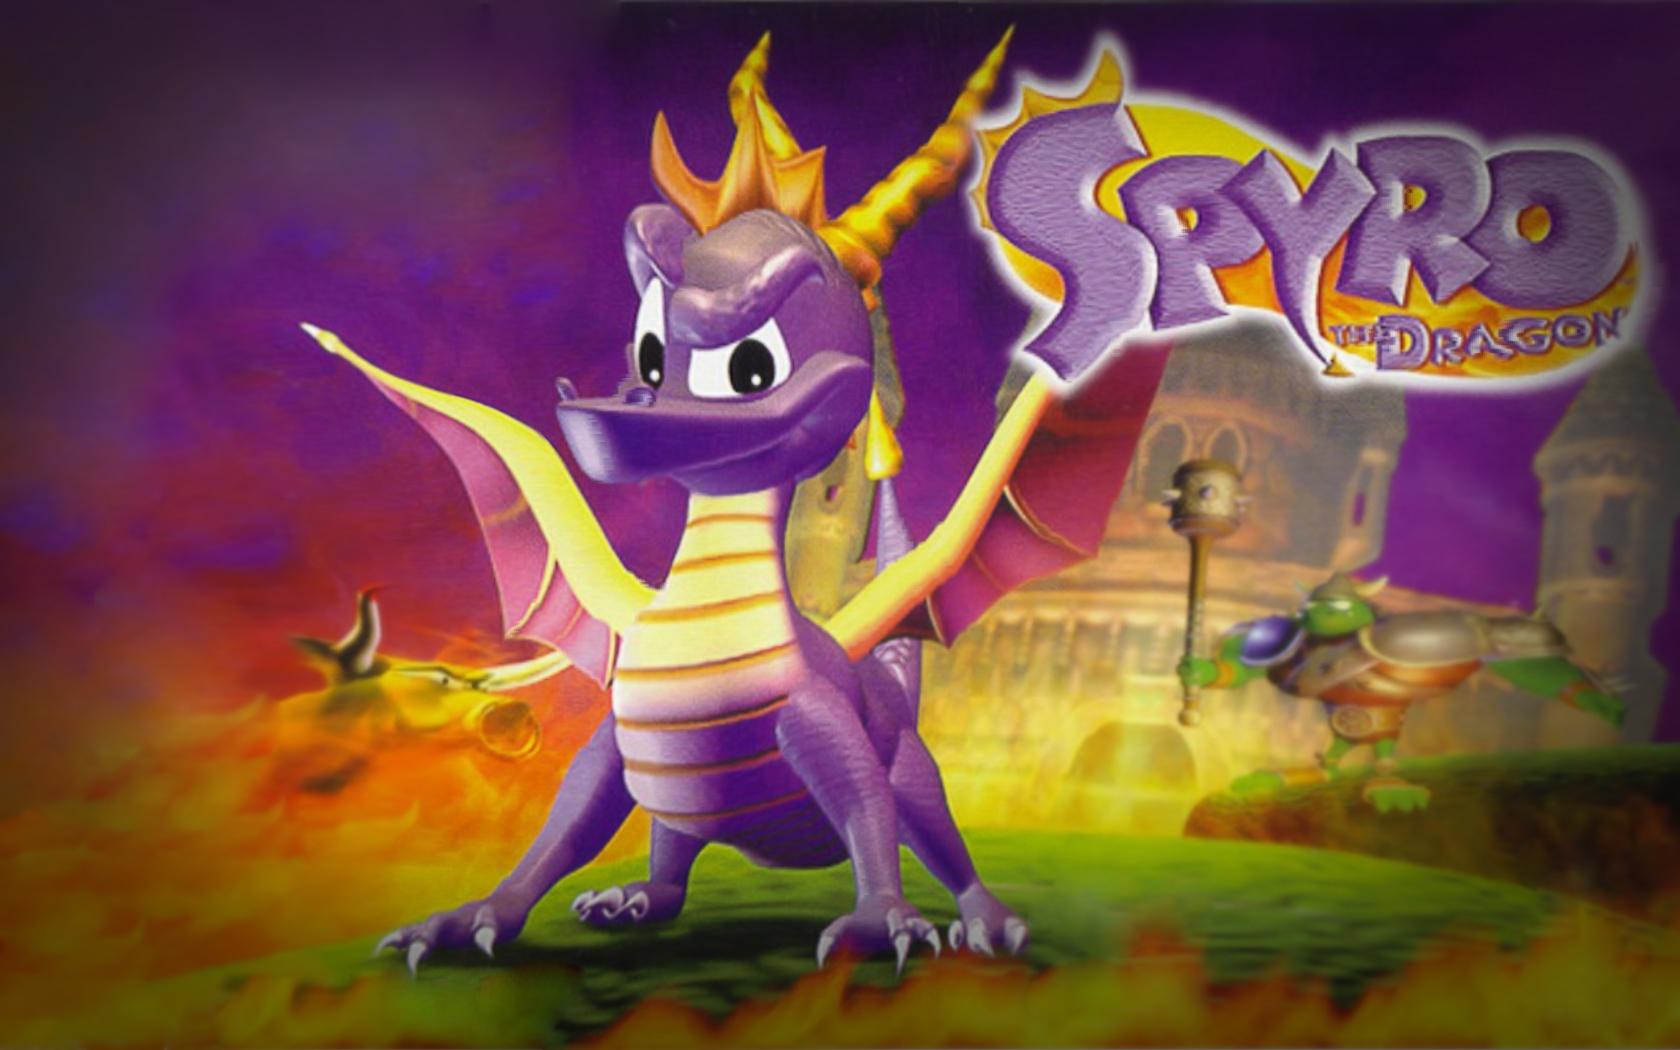 Spyro the Dragon kertas dinding